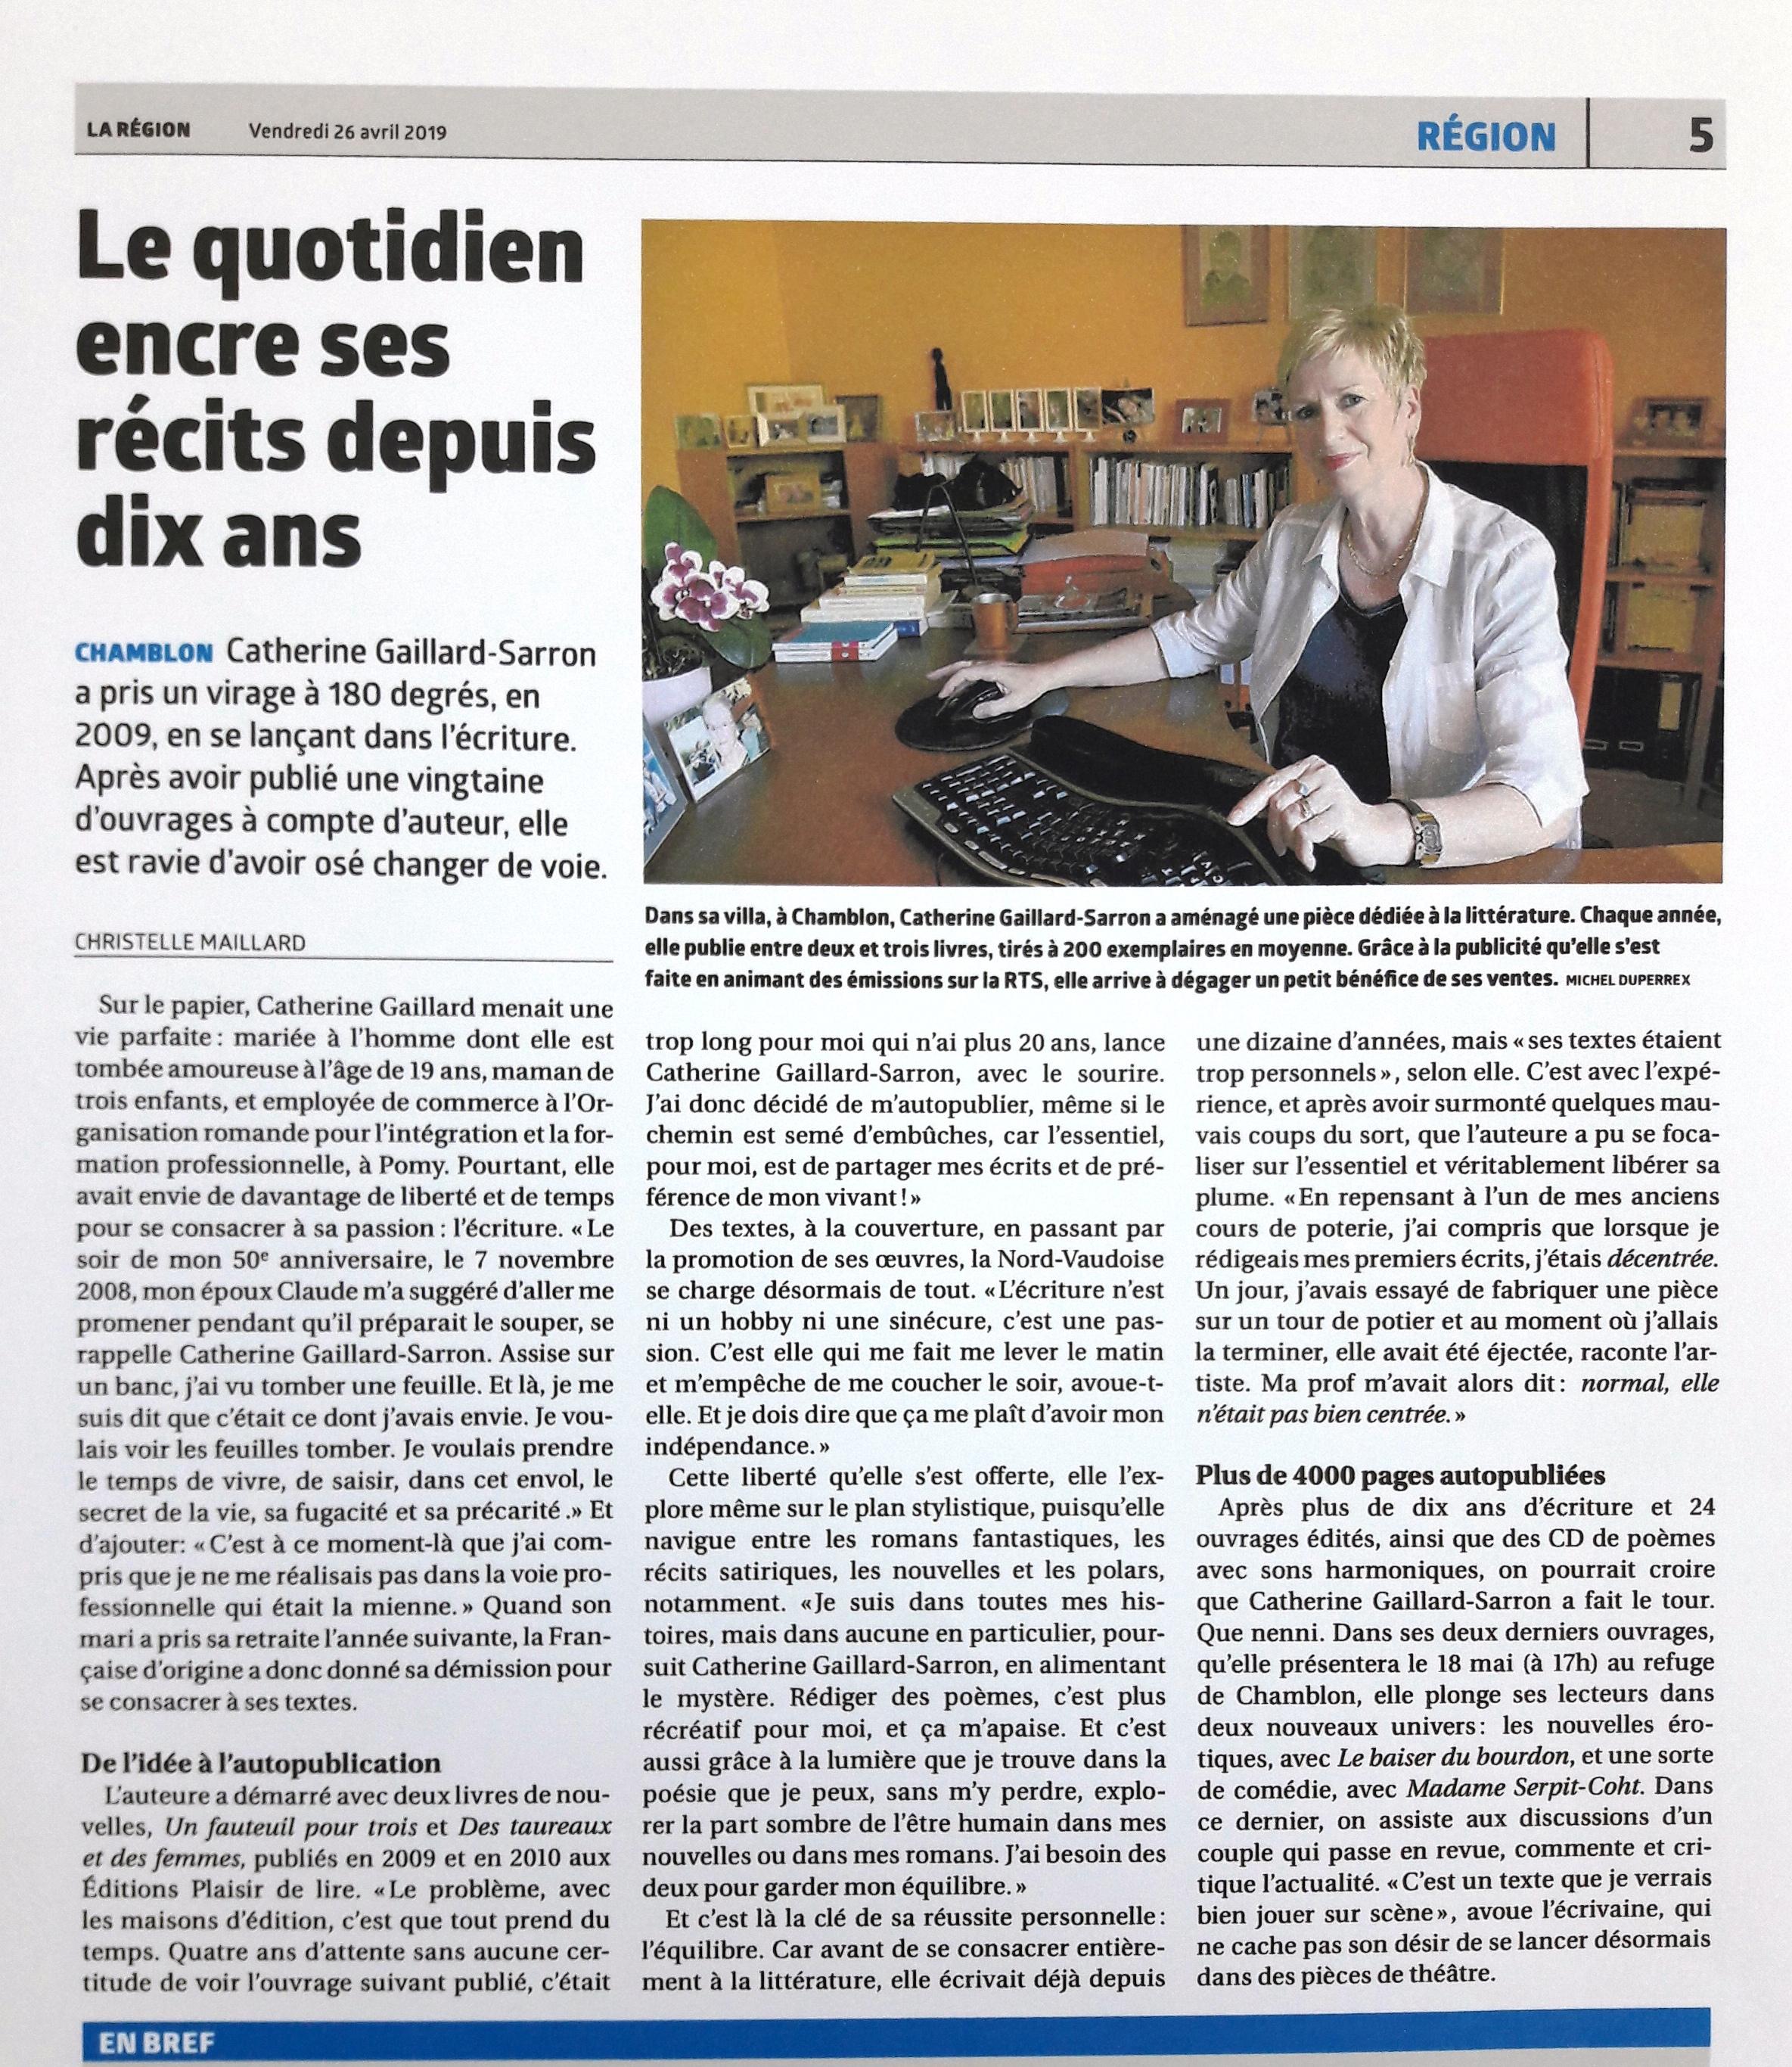 Catherine Gaillard-Sarron, La Région du 26.4.19